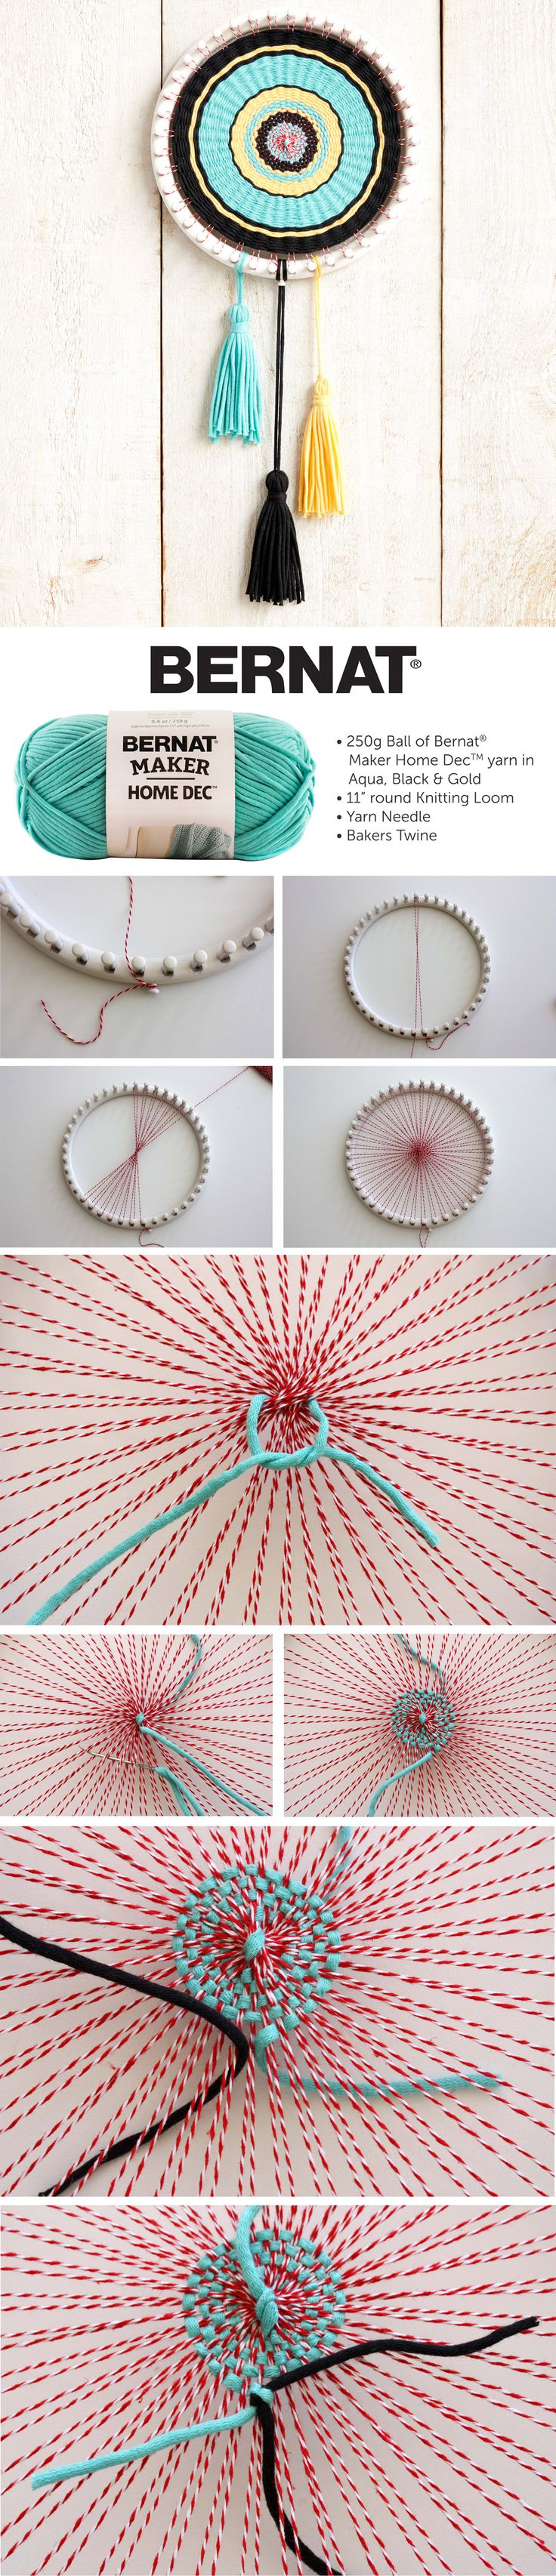 Bernat Circle Loom Weaving | Circle Loom Weaving | Bernat | Yarnspirations | Home Dec | kaleidoscopic project                                                                                                                                                                                 More